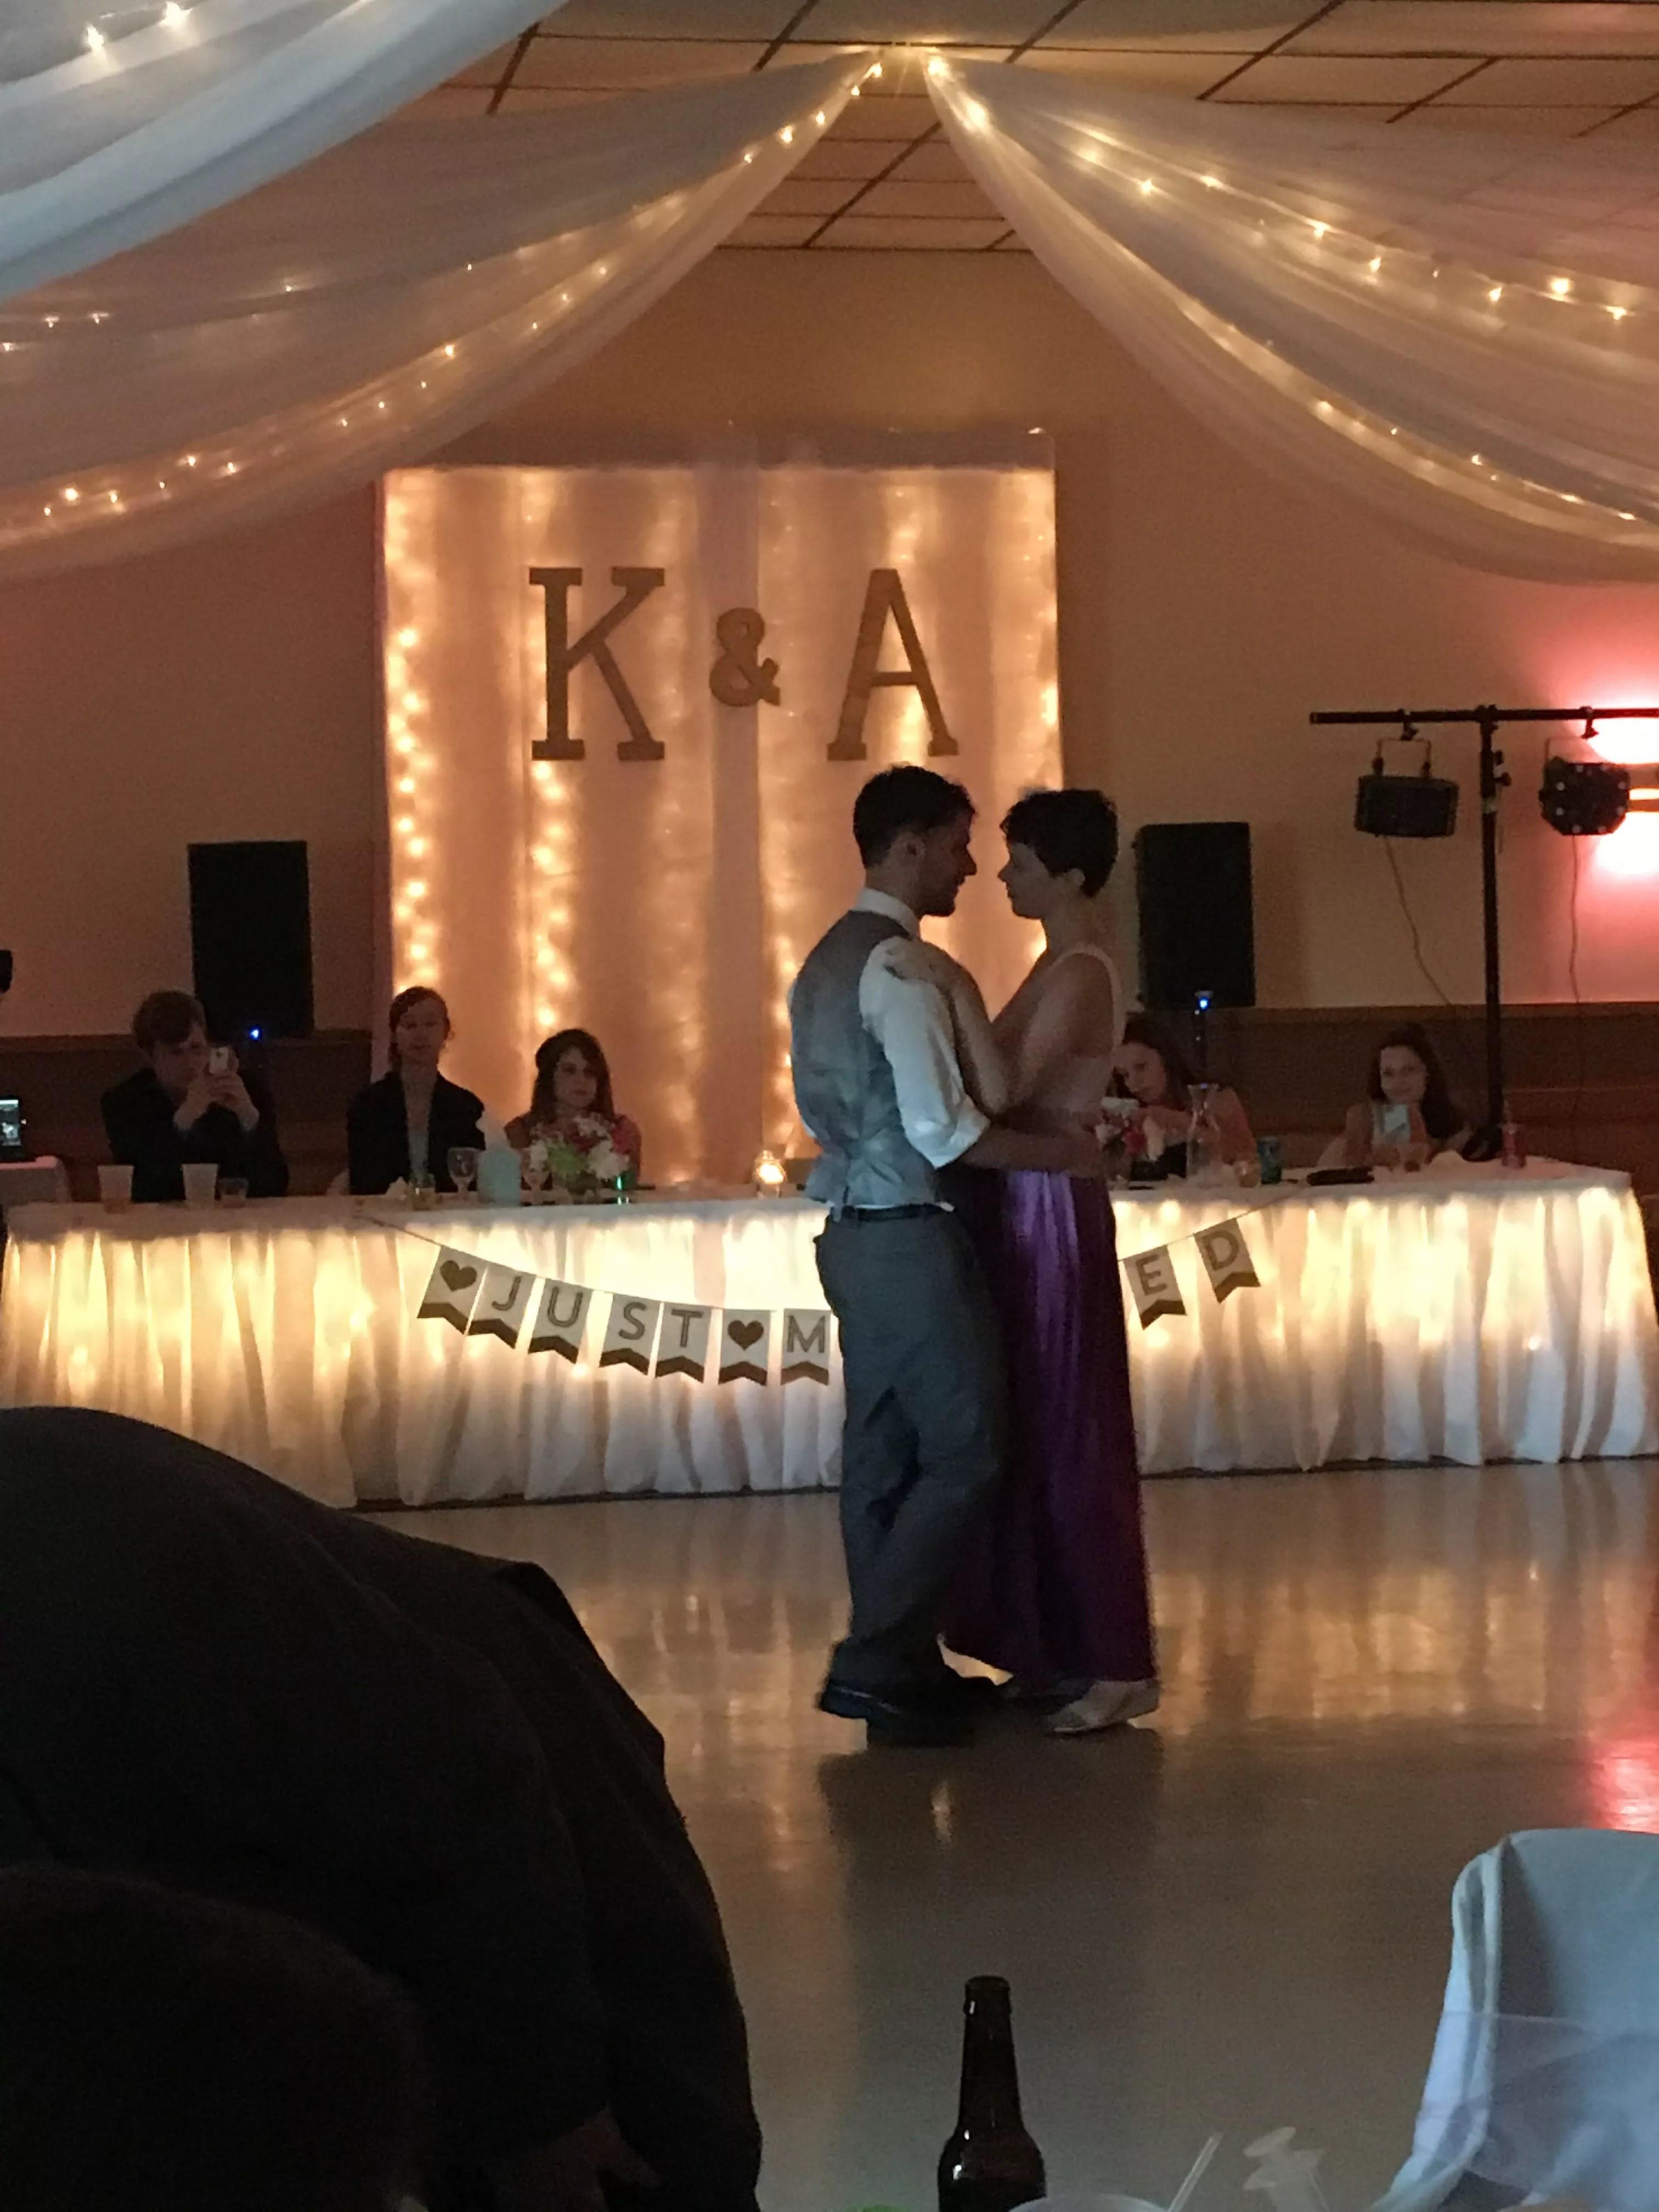 Stillwater Weddings  the KC Hall  Reception Venues